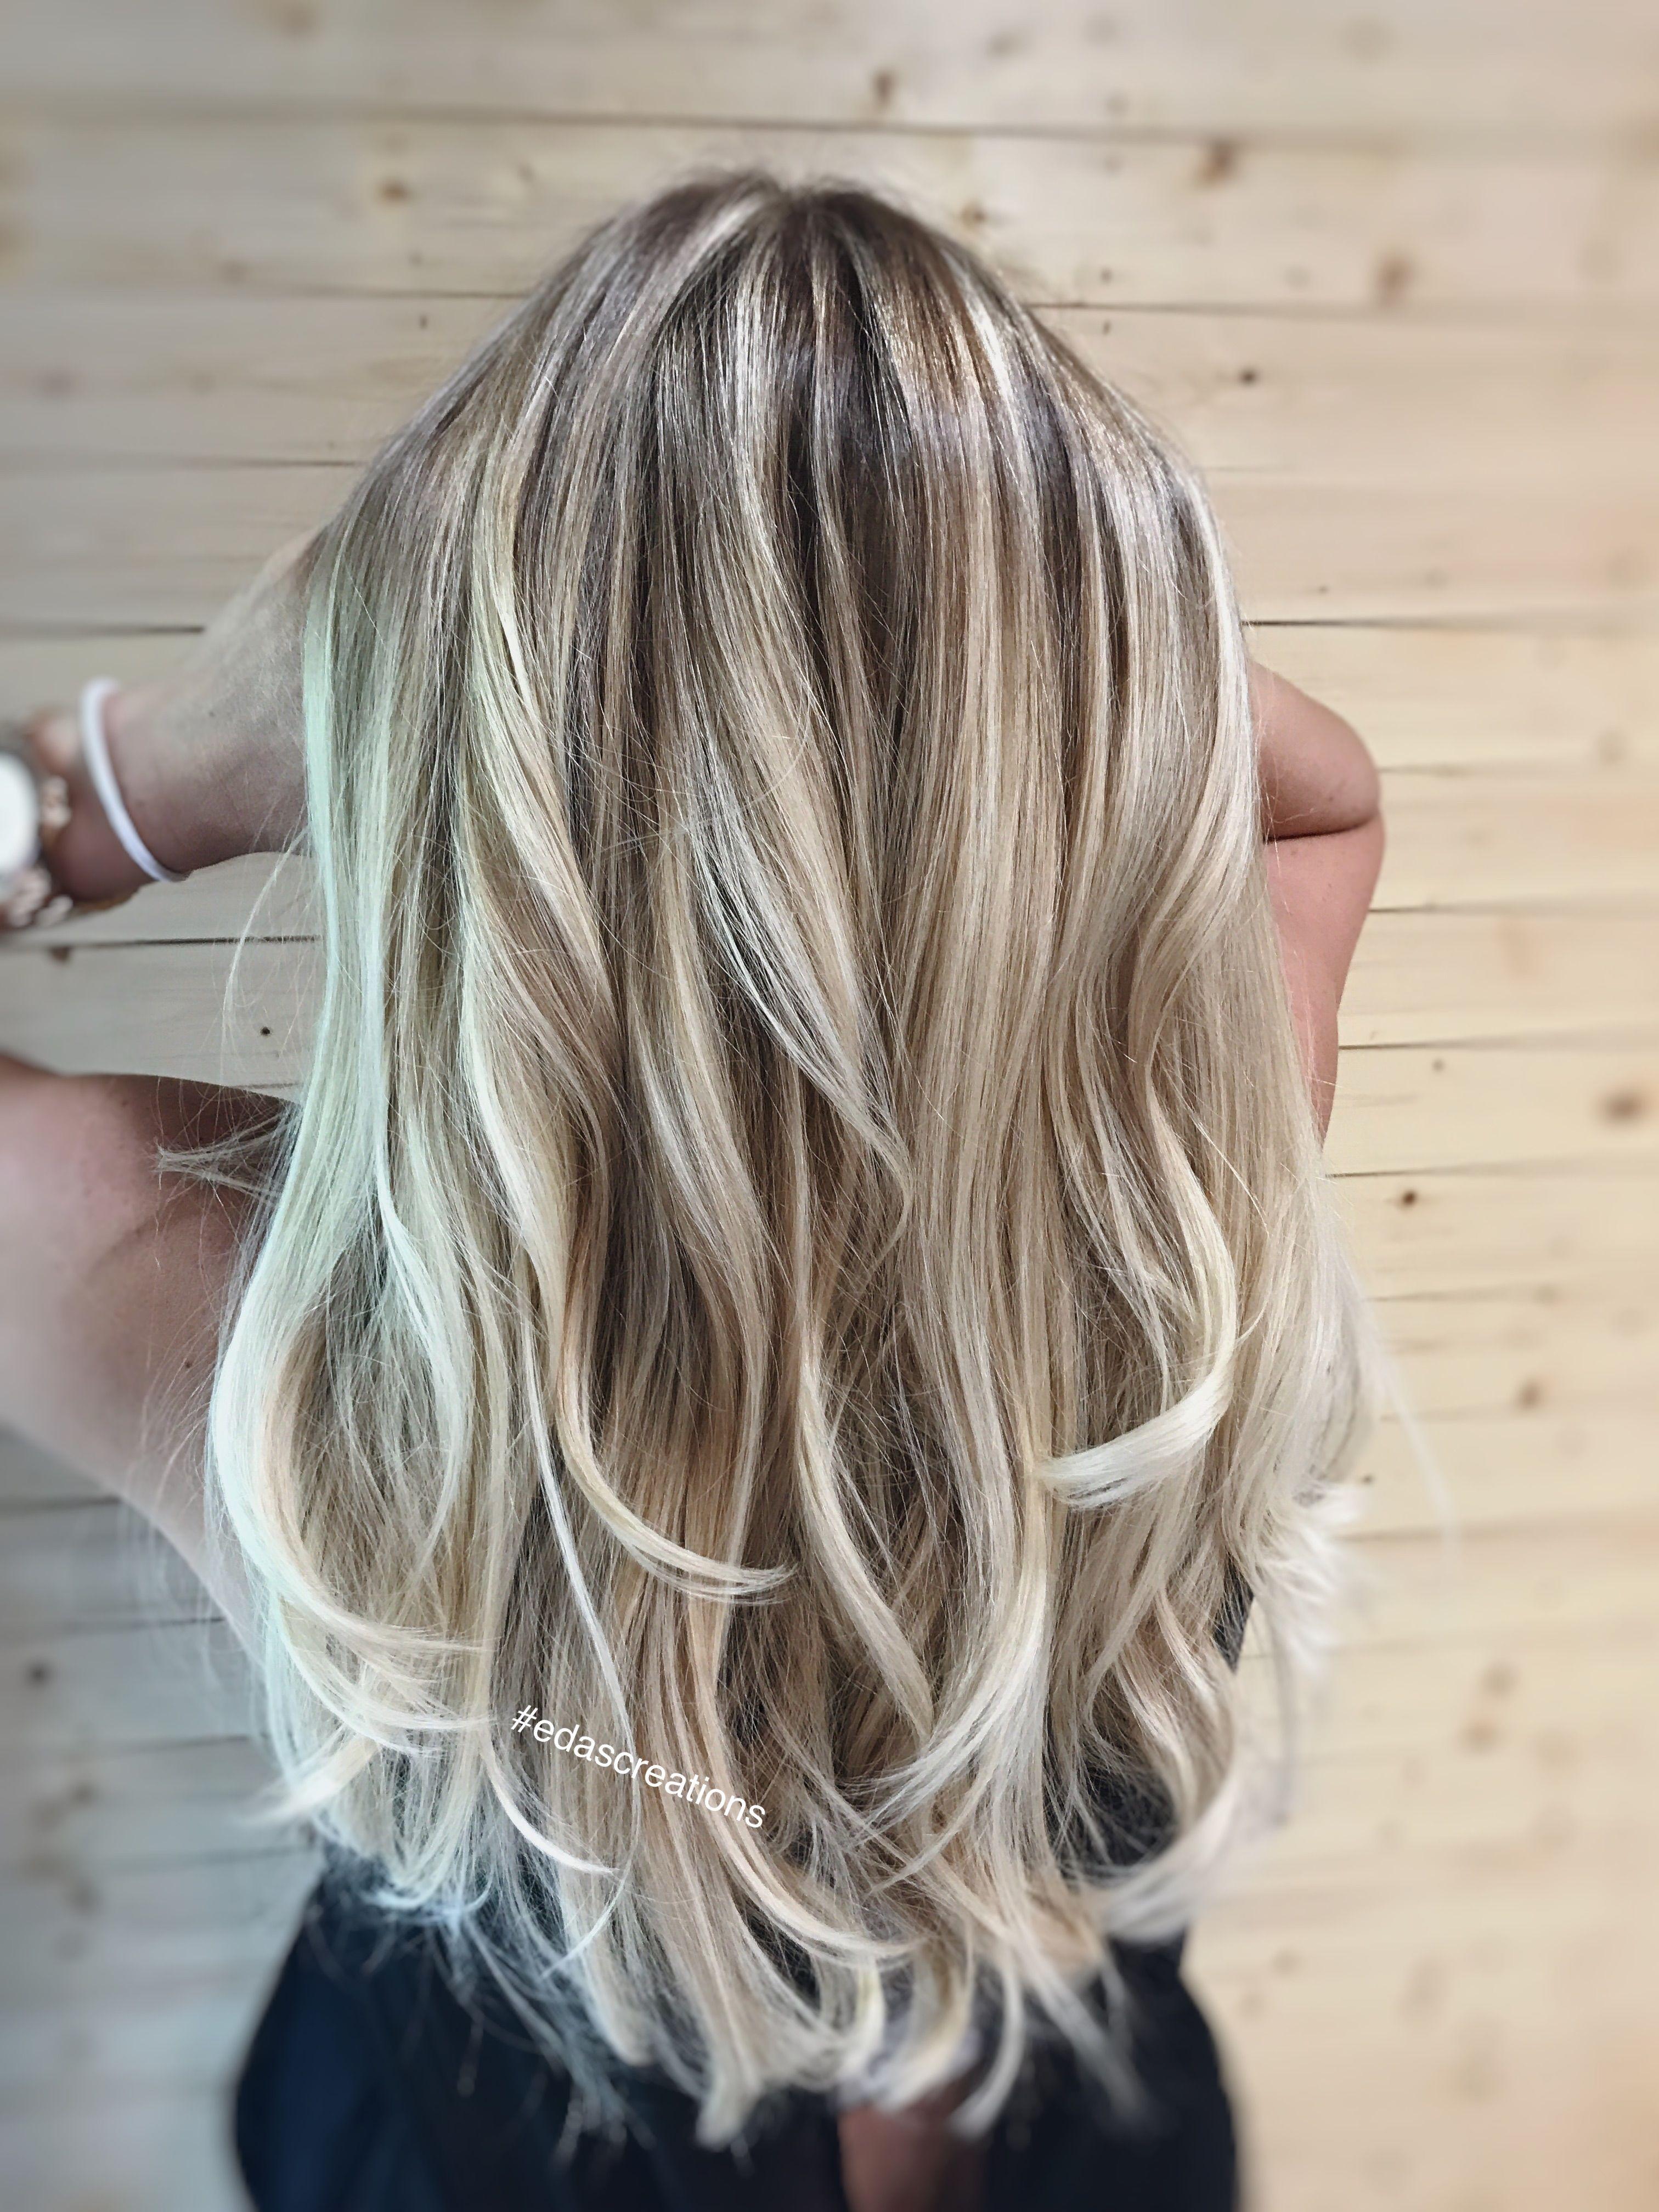 Balayage long hair blonde (With images) | Balayage long hair, Balayage hair, Long hair styles